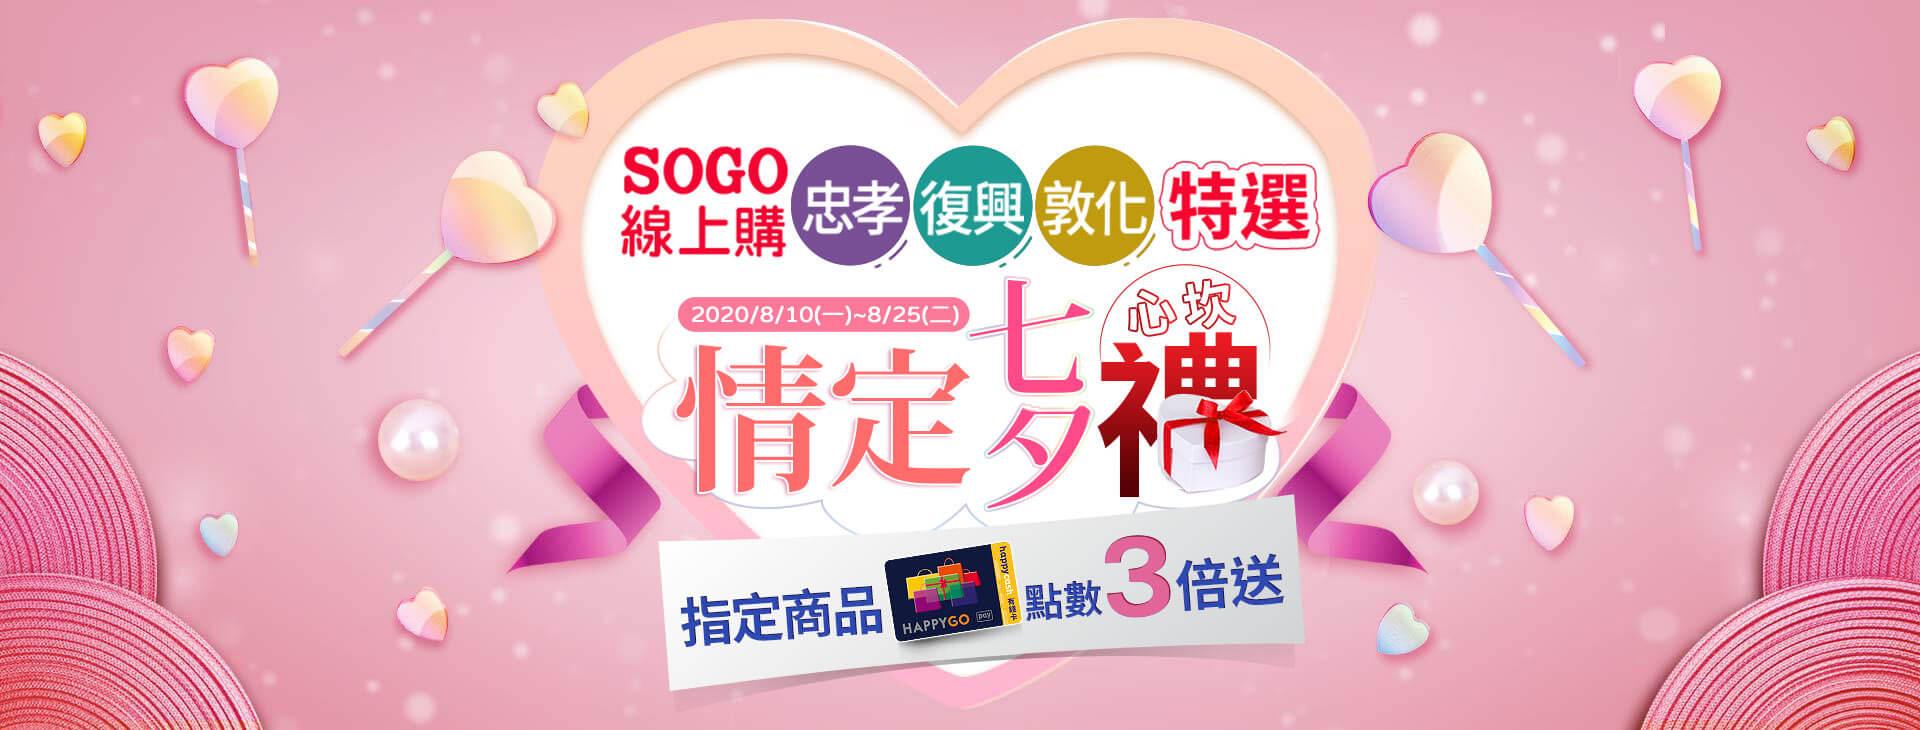 SOGO線上購「情定七夕禮」